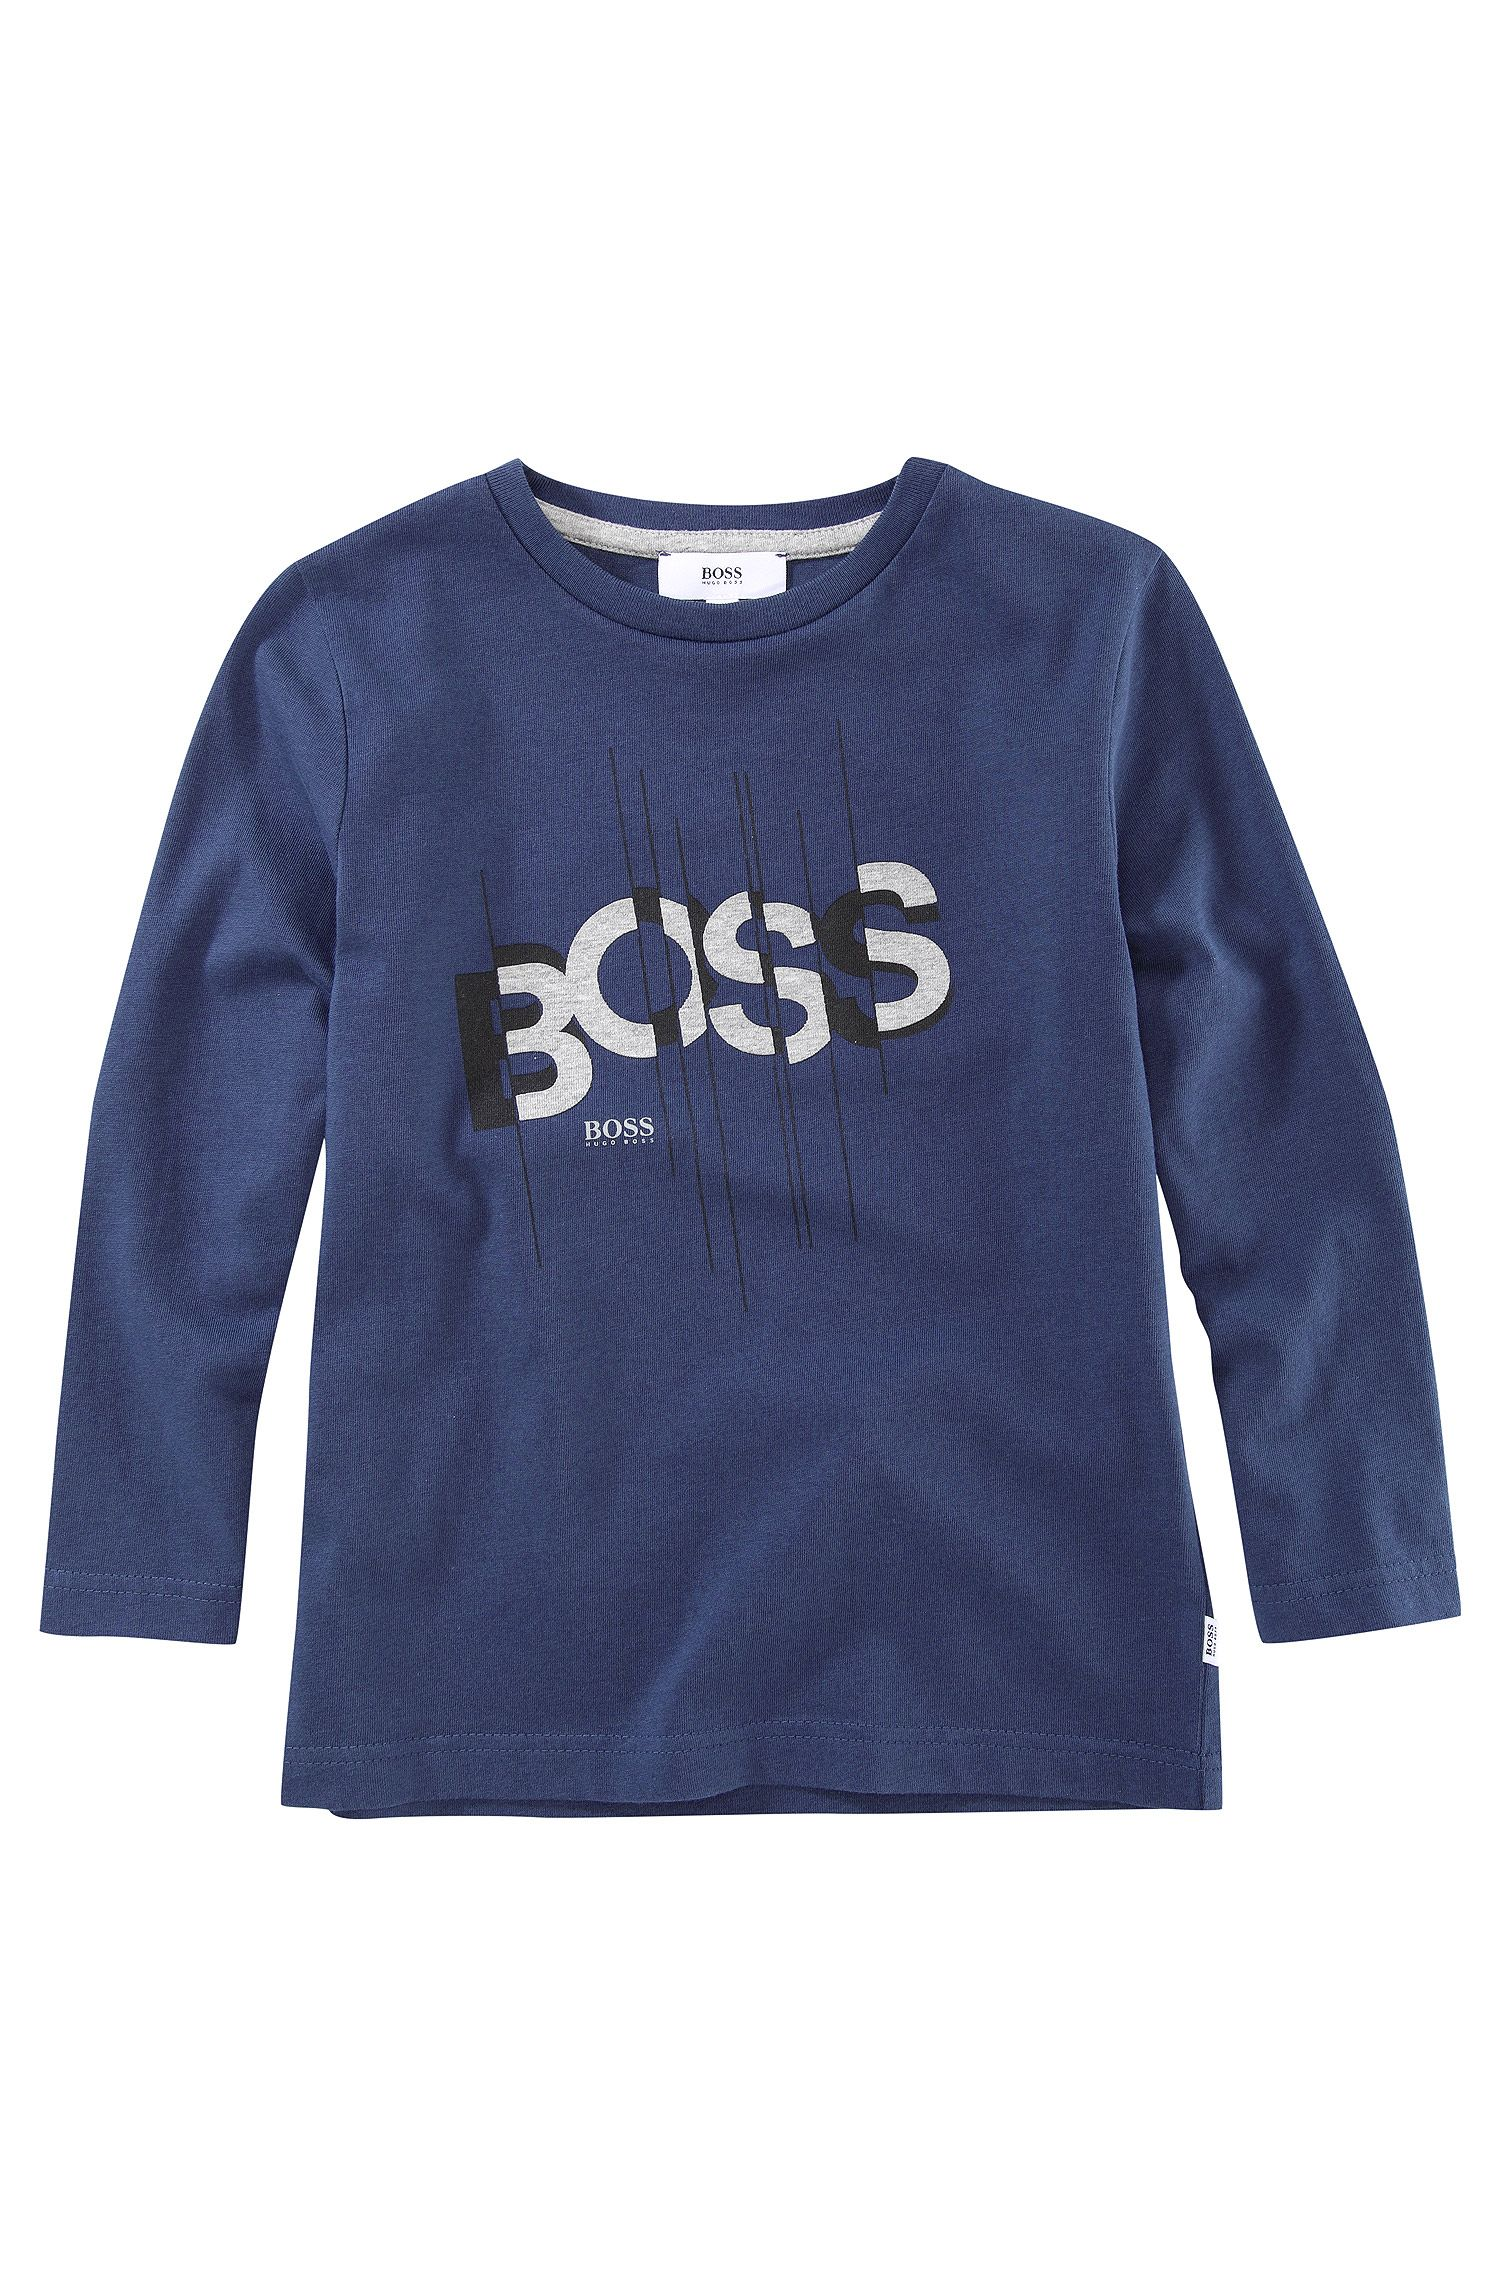 'J25581' | Boys Long-Sleeved Cotton Crewneck Graphic T-Shirt